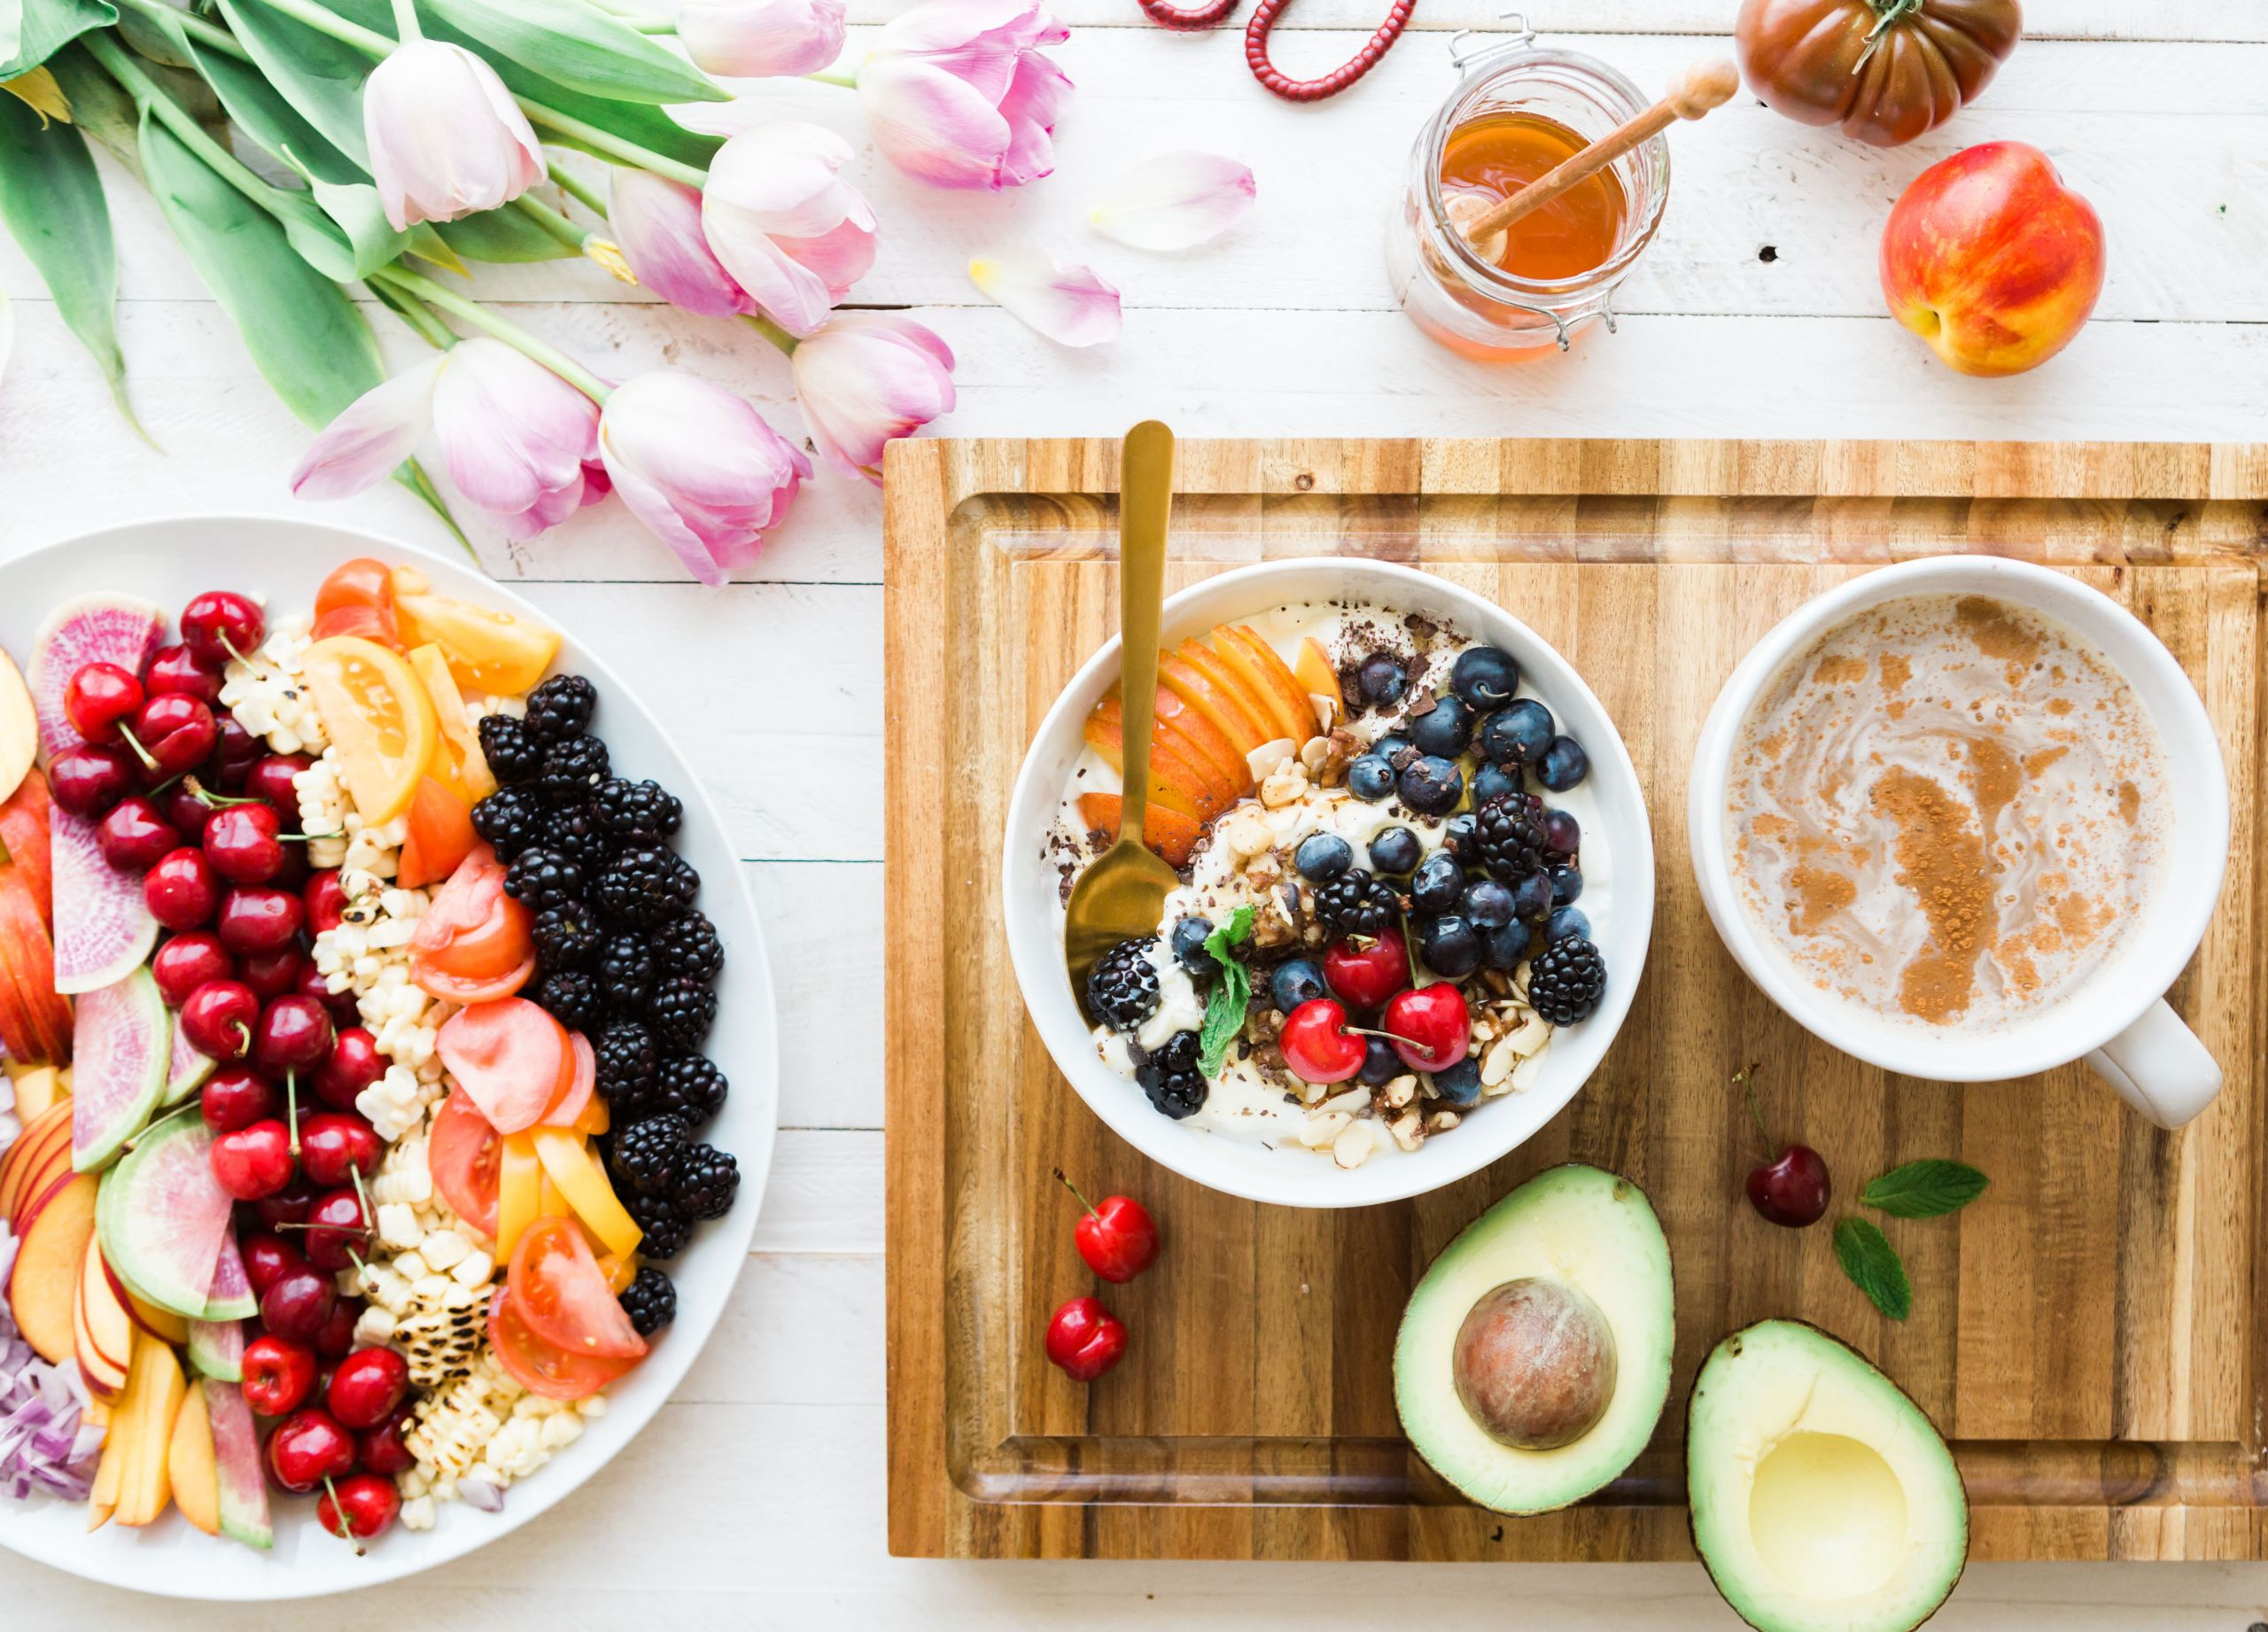 Keto Breakfast Recipes For Beginners  90 Keto Diet Recipes For Breakfast Lunch & Dinner